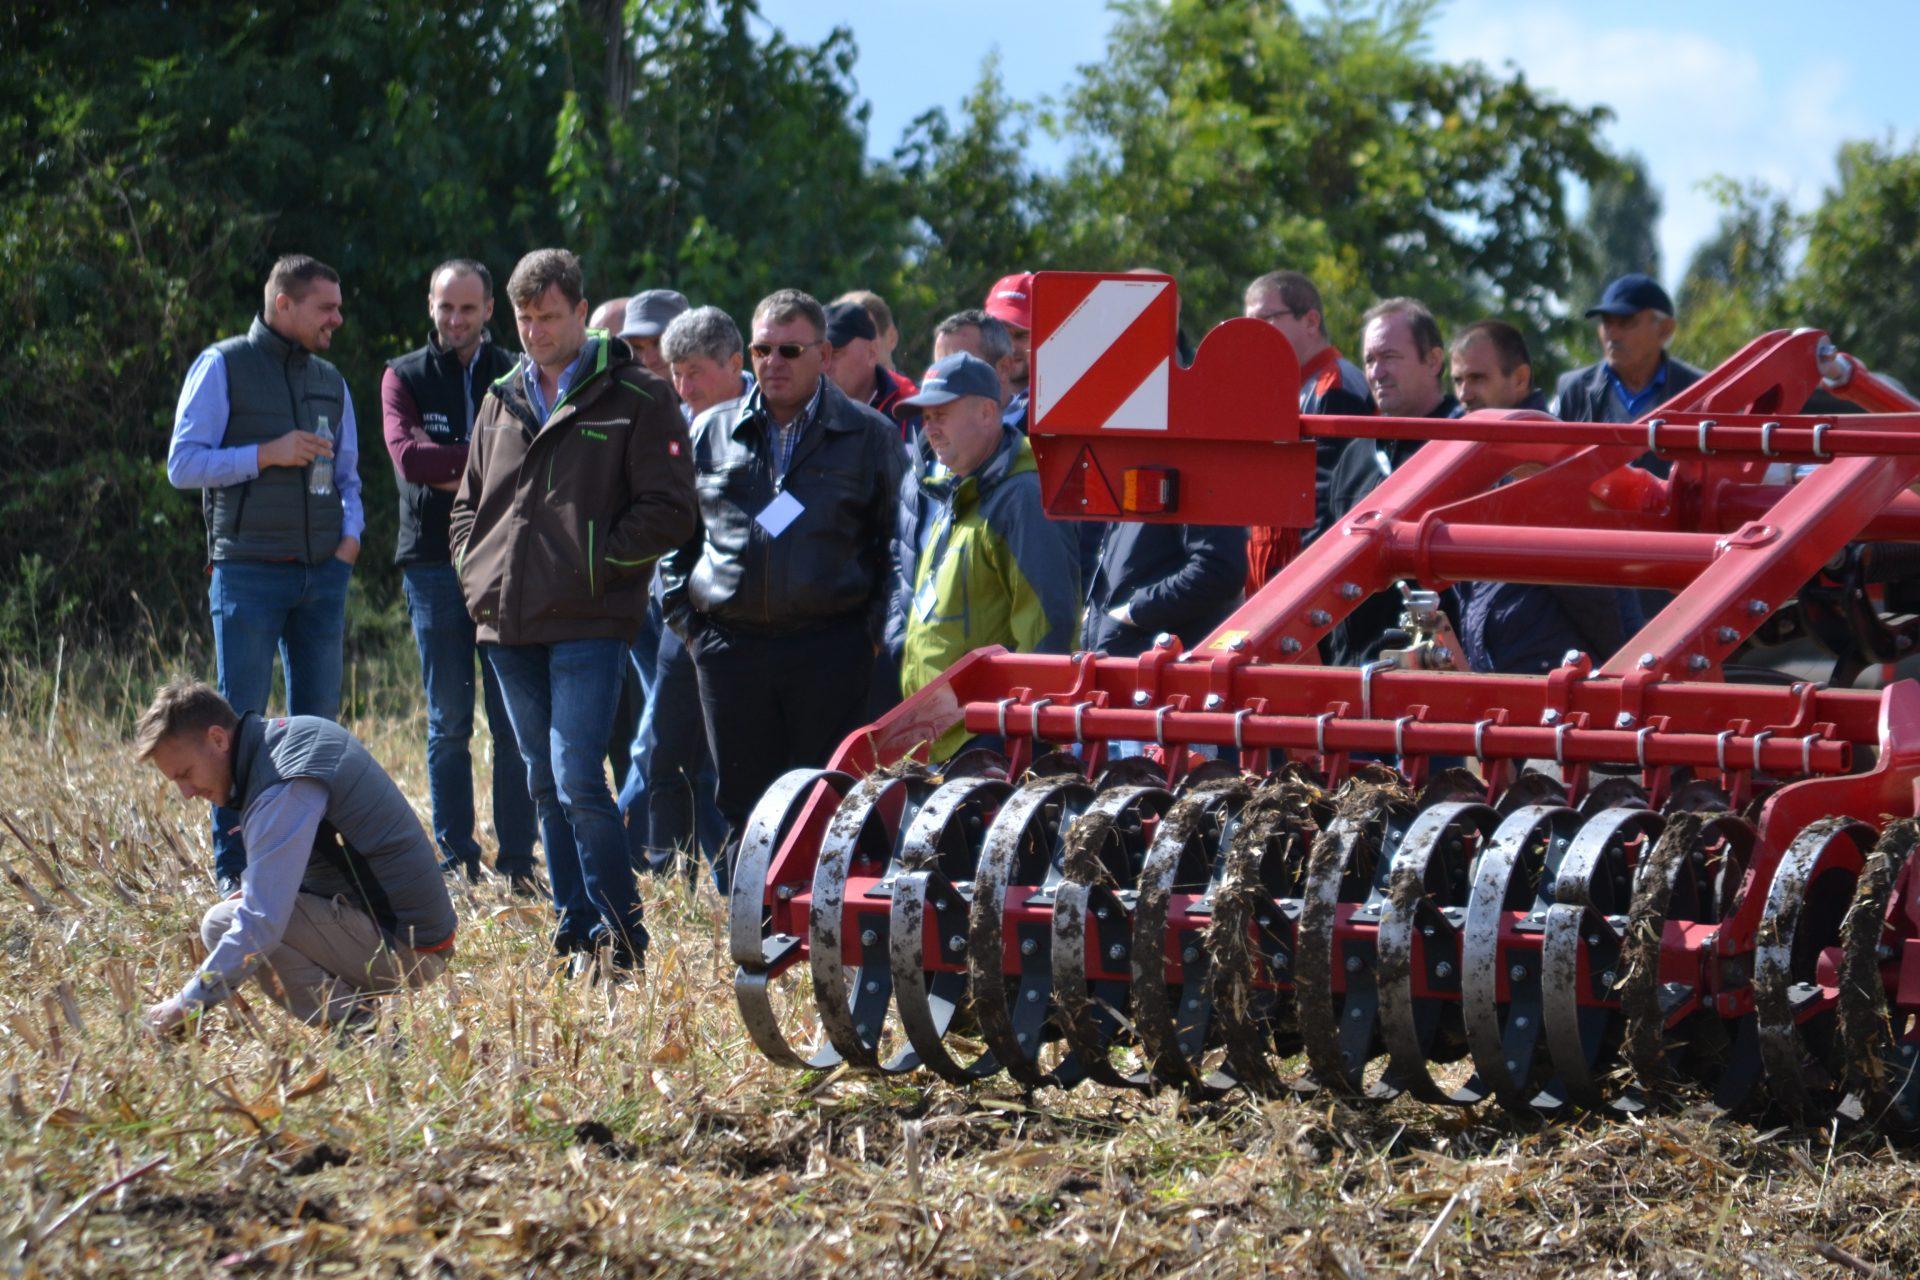 Cultivator Horsch TERRANO GX la demonstrații